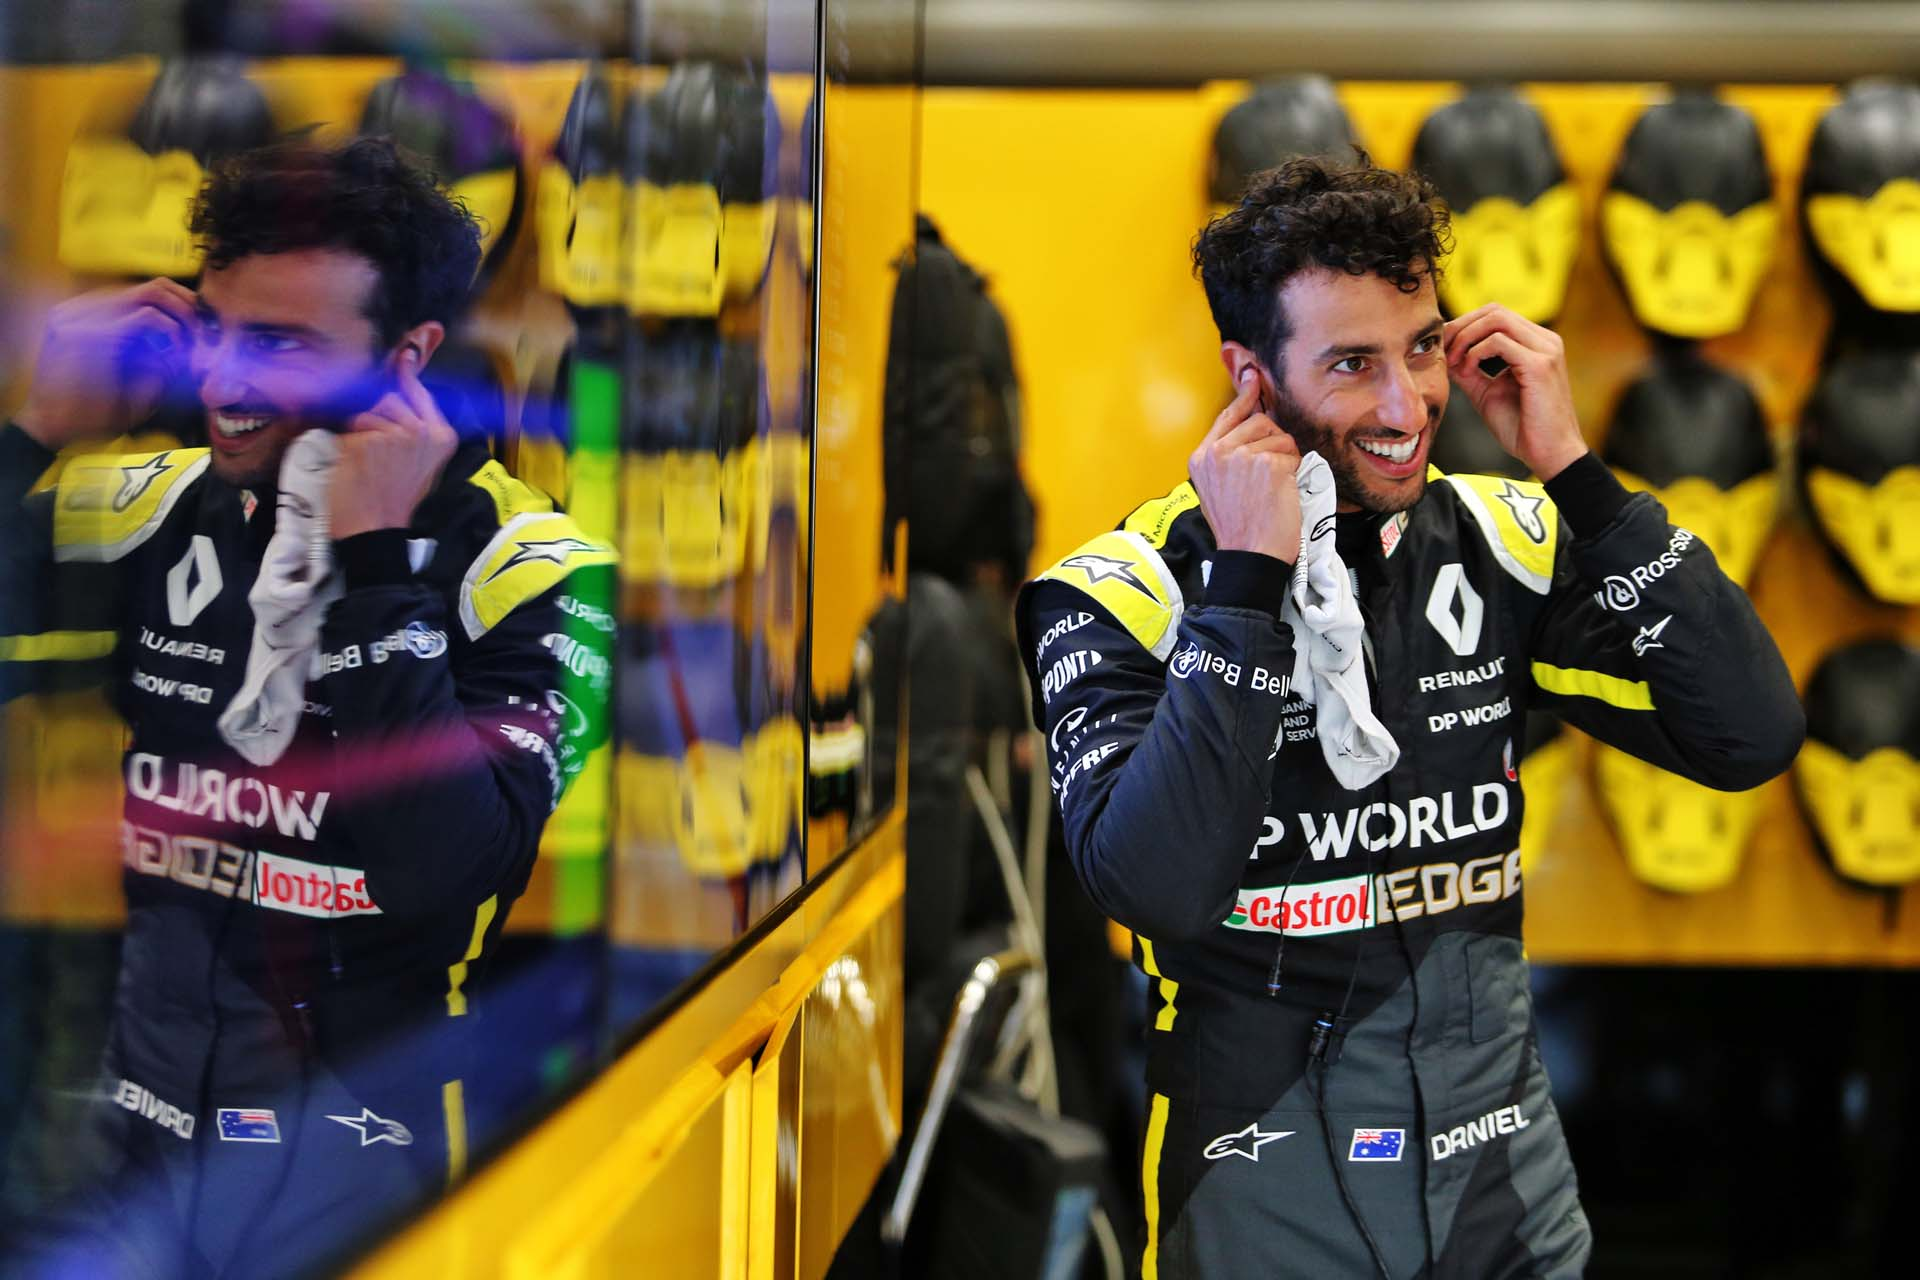 Motor Racing - Formula One World Championship - Belgian Grand Prix - Qualifying Day - Spa Francorchamps, Belgium